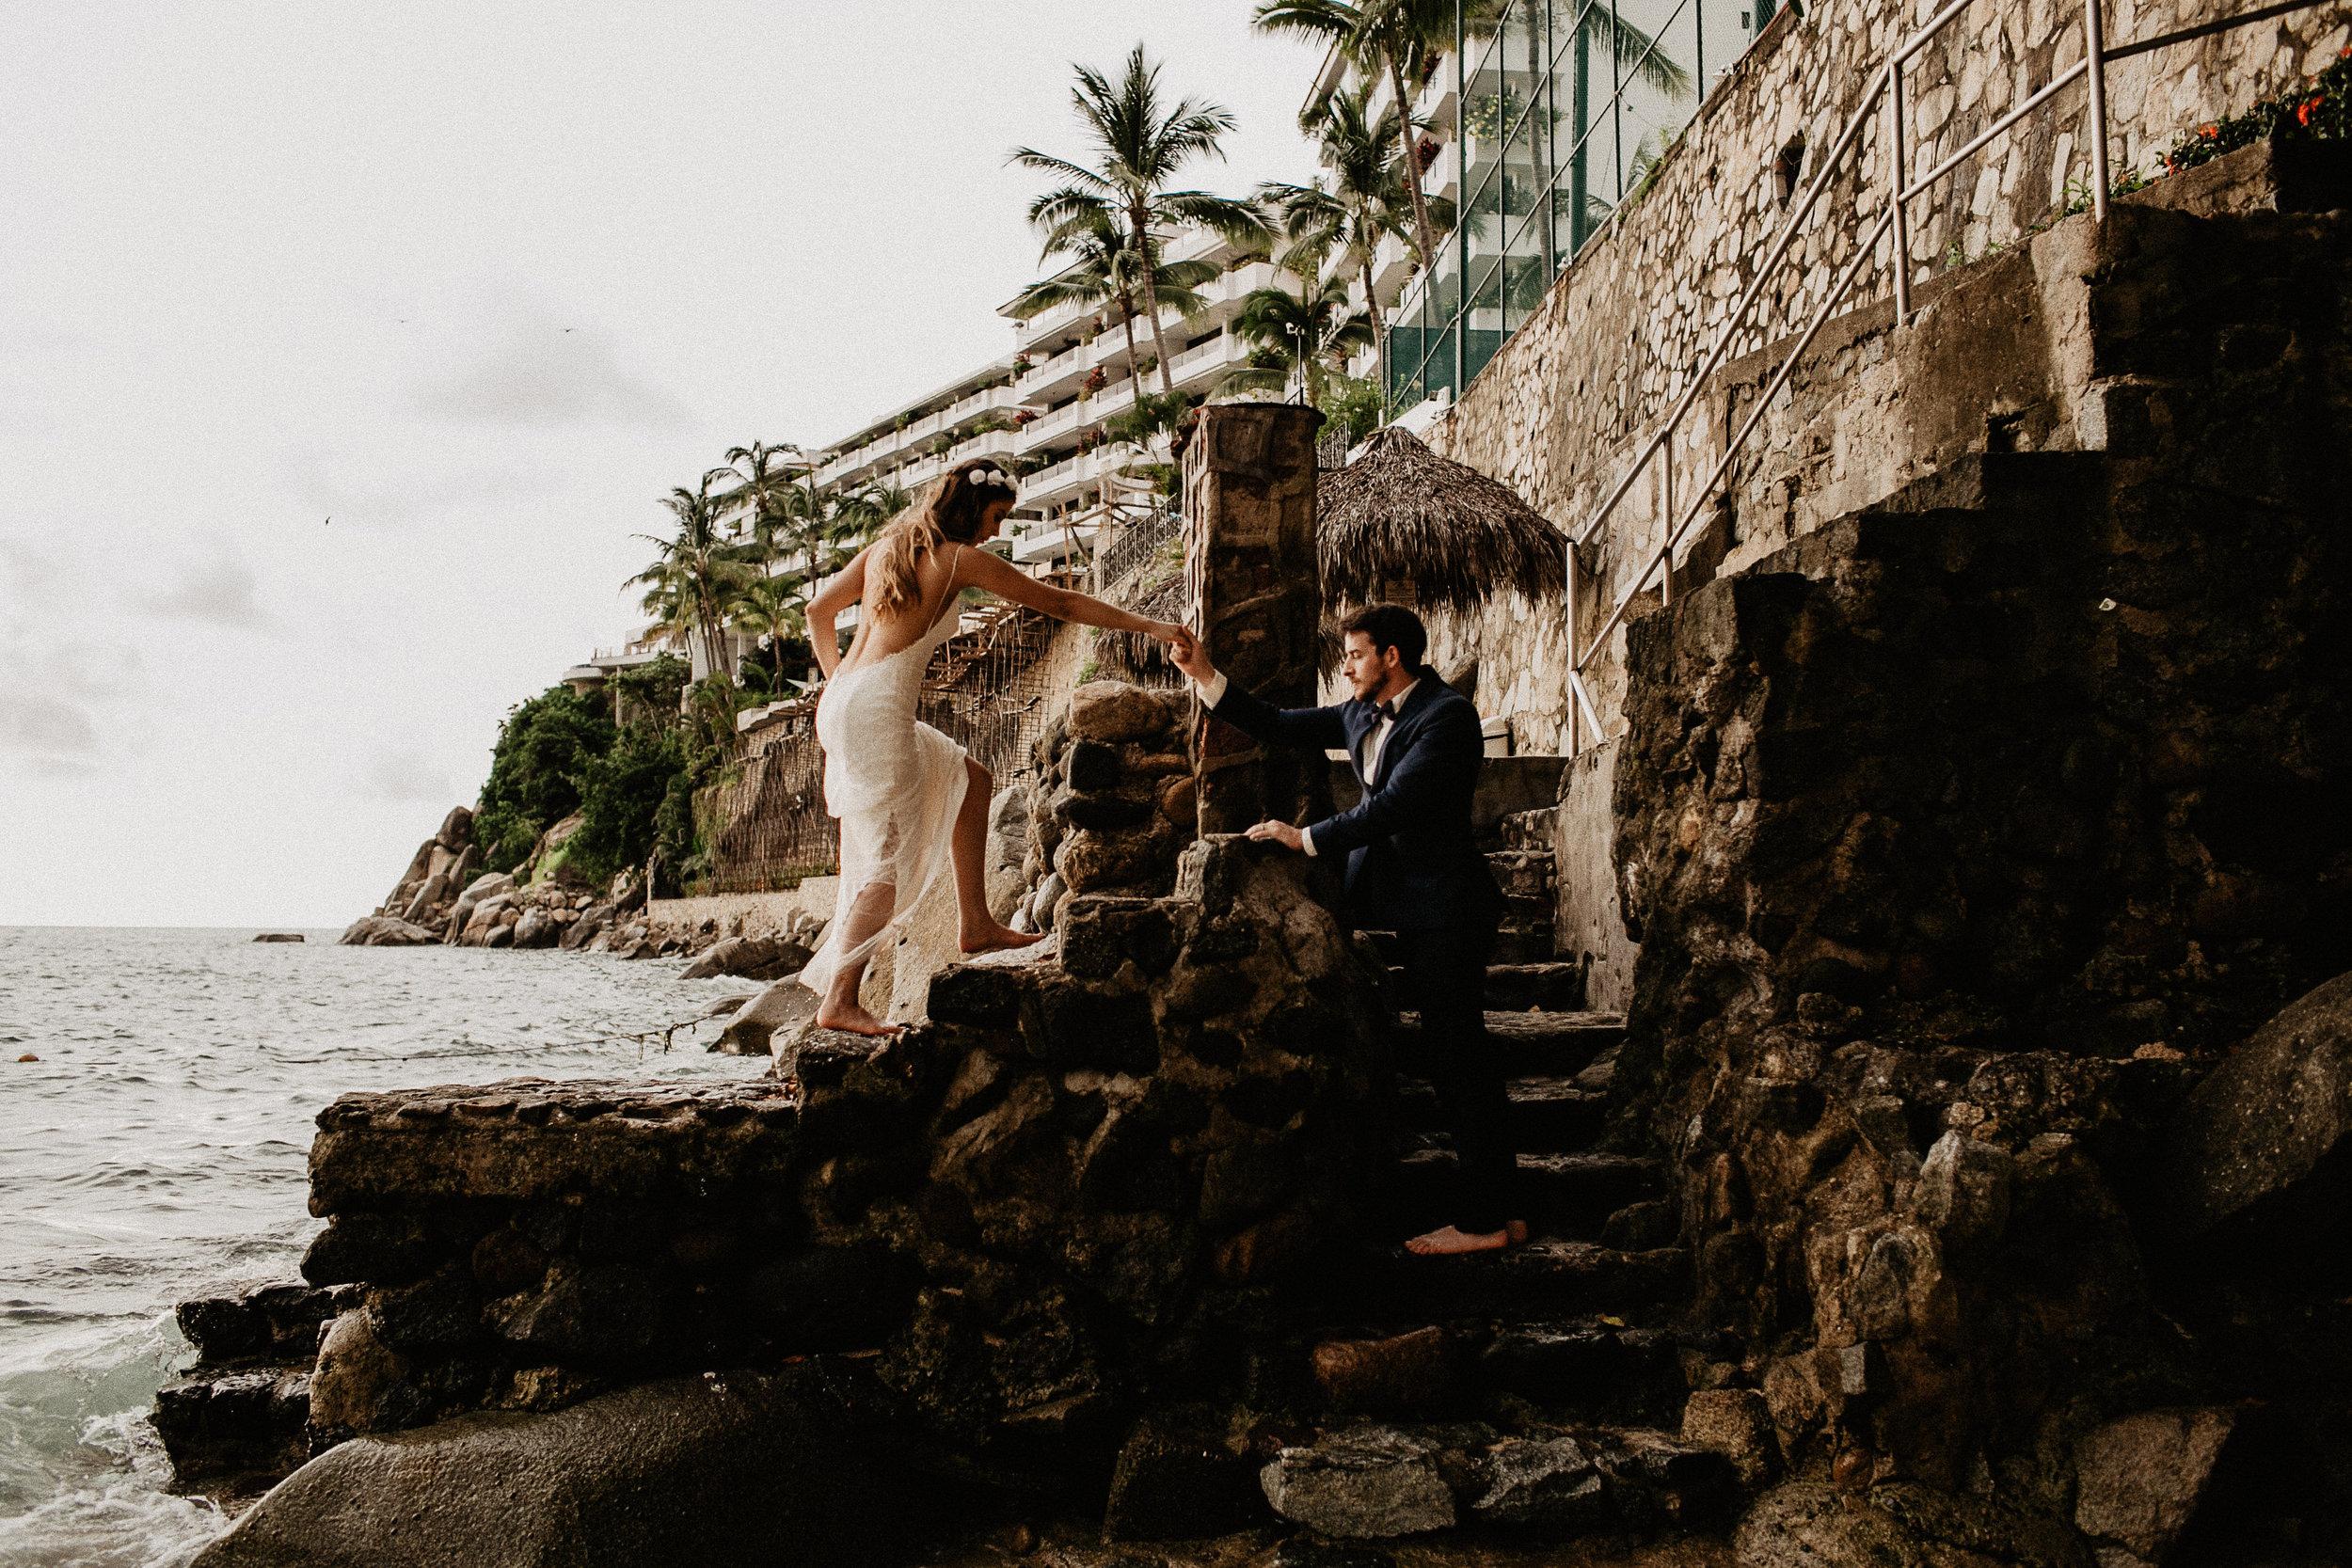 alfonso_flores_destination_wedding_photography_puerto_vallarta_hotel_barcelo_vallarta_cuttler_amela-751.JPG